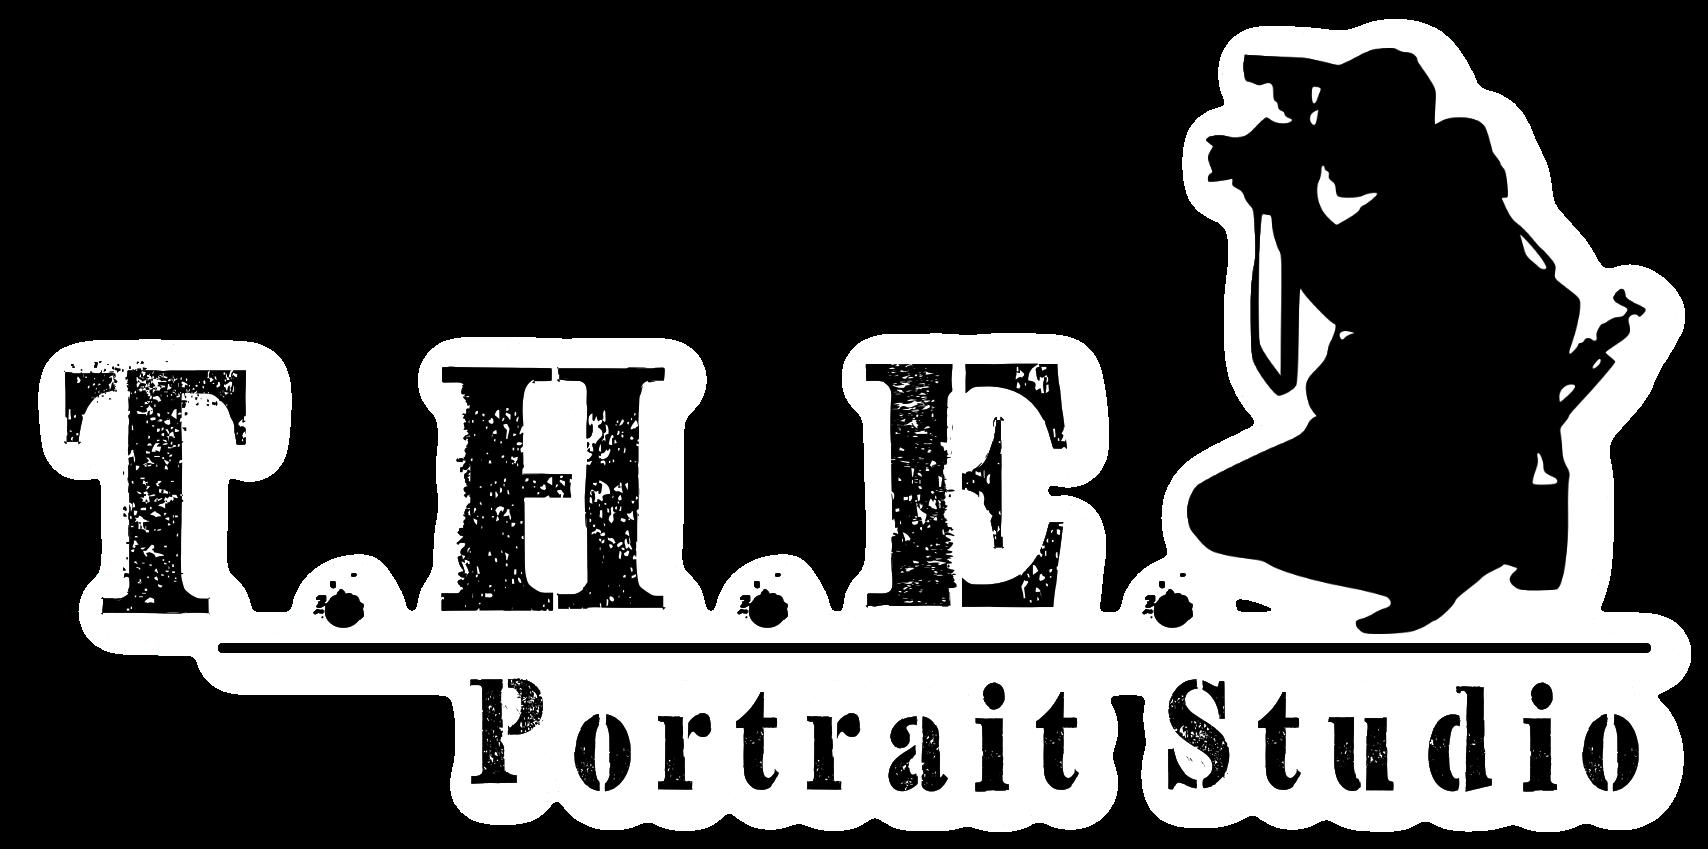 PortraitStudio369.com